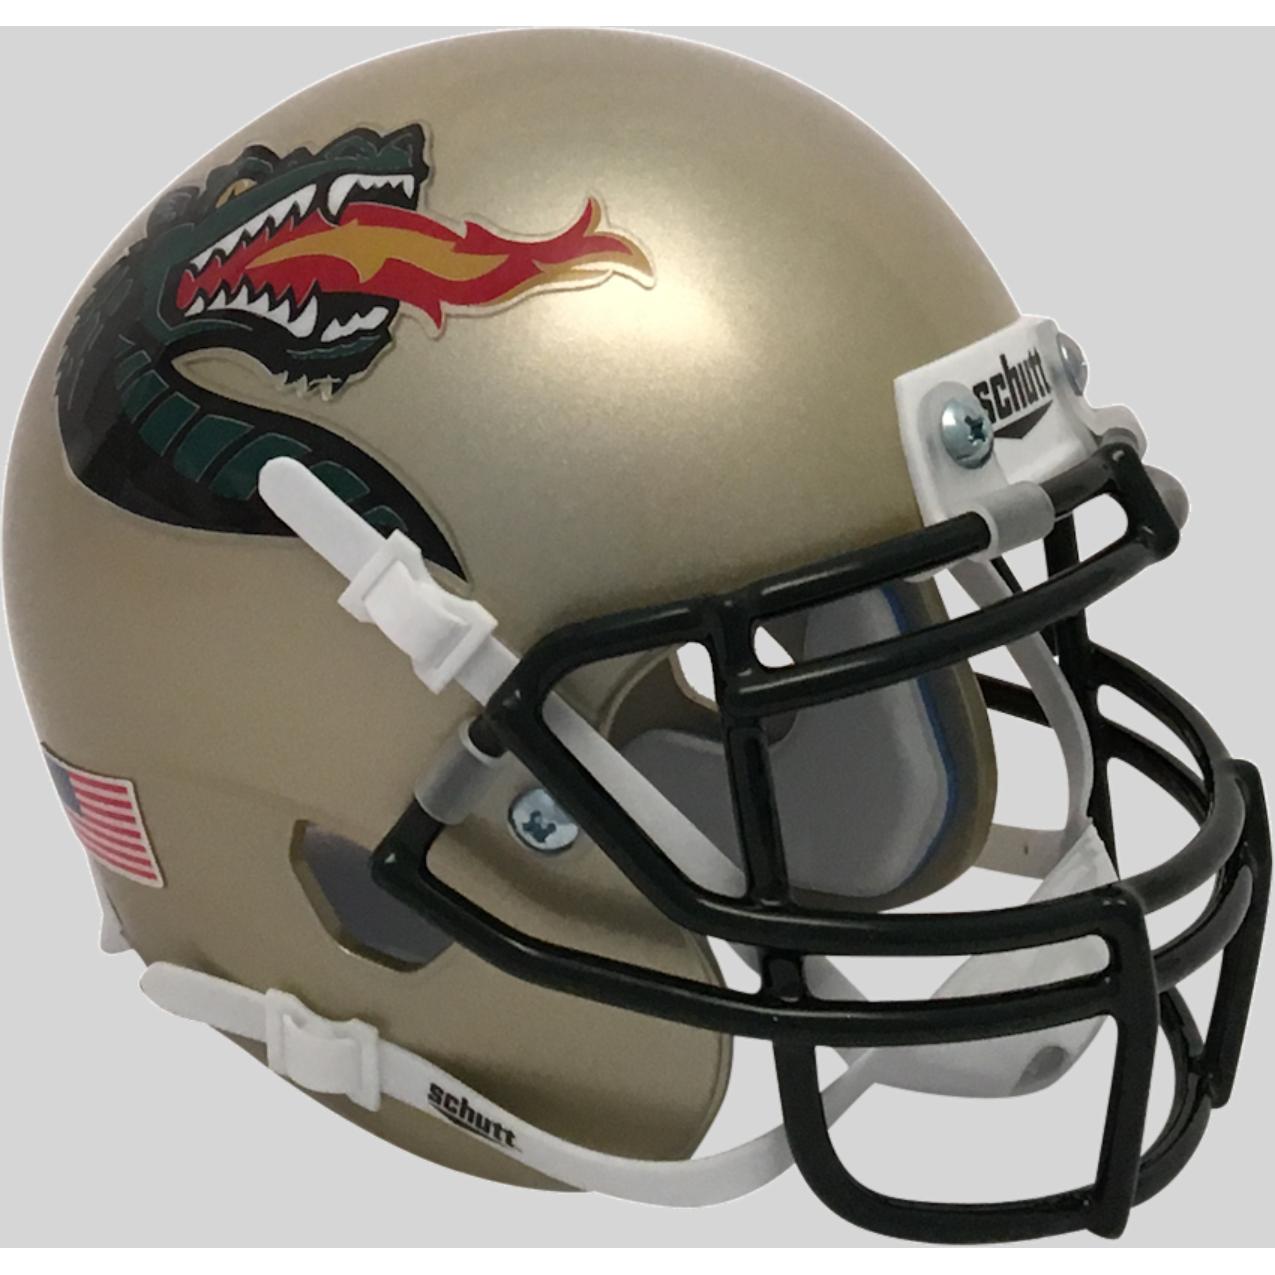 13bdc7e0d5e UAB Alabama-Birmingham Blazers Alternate Gold Schutt Mini Authentic Helmet.  Schutt · Image 1